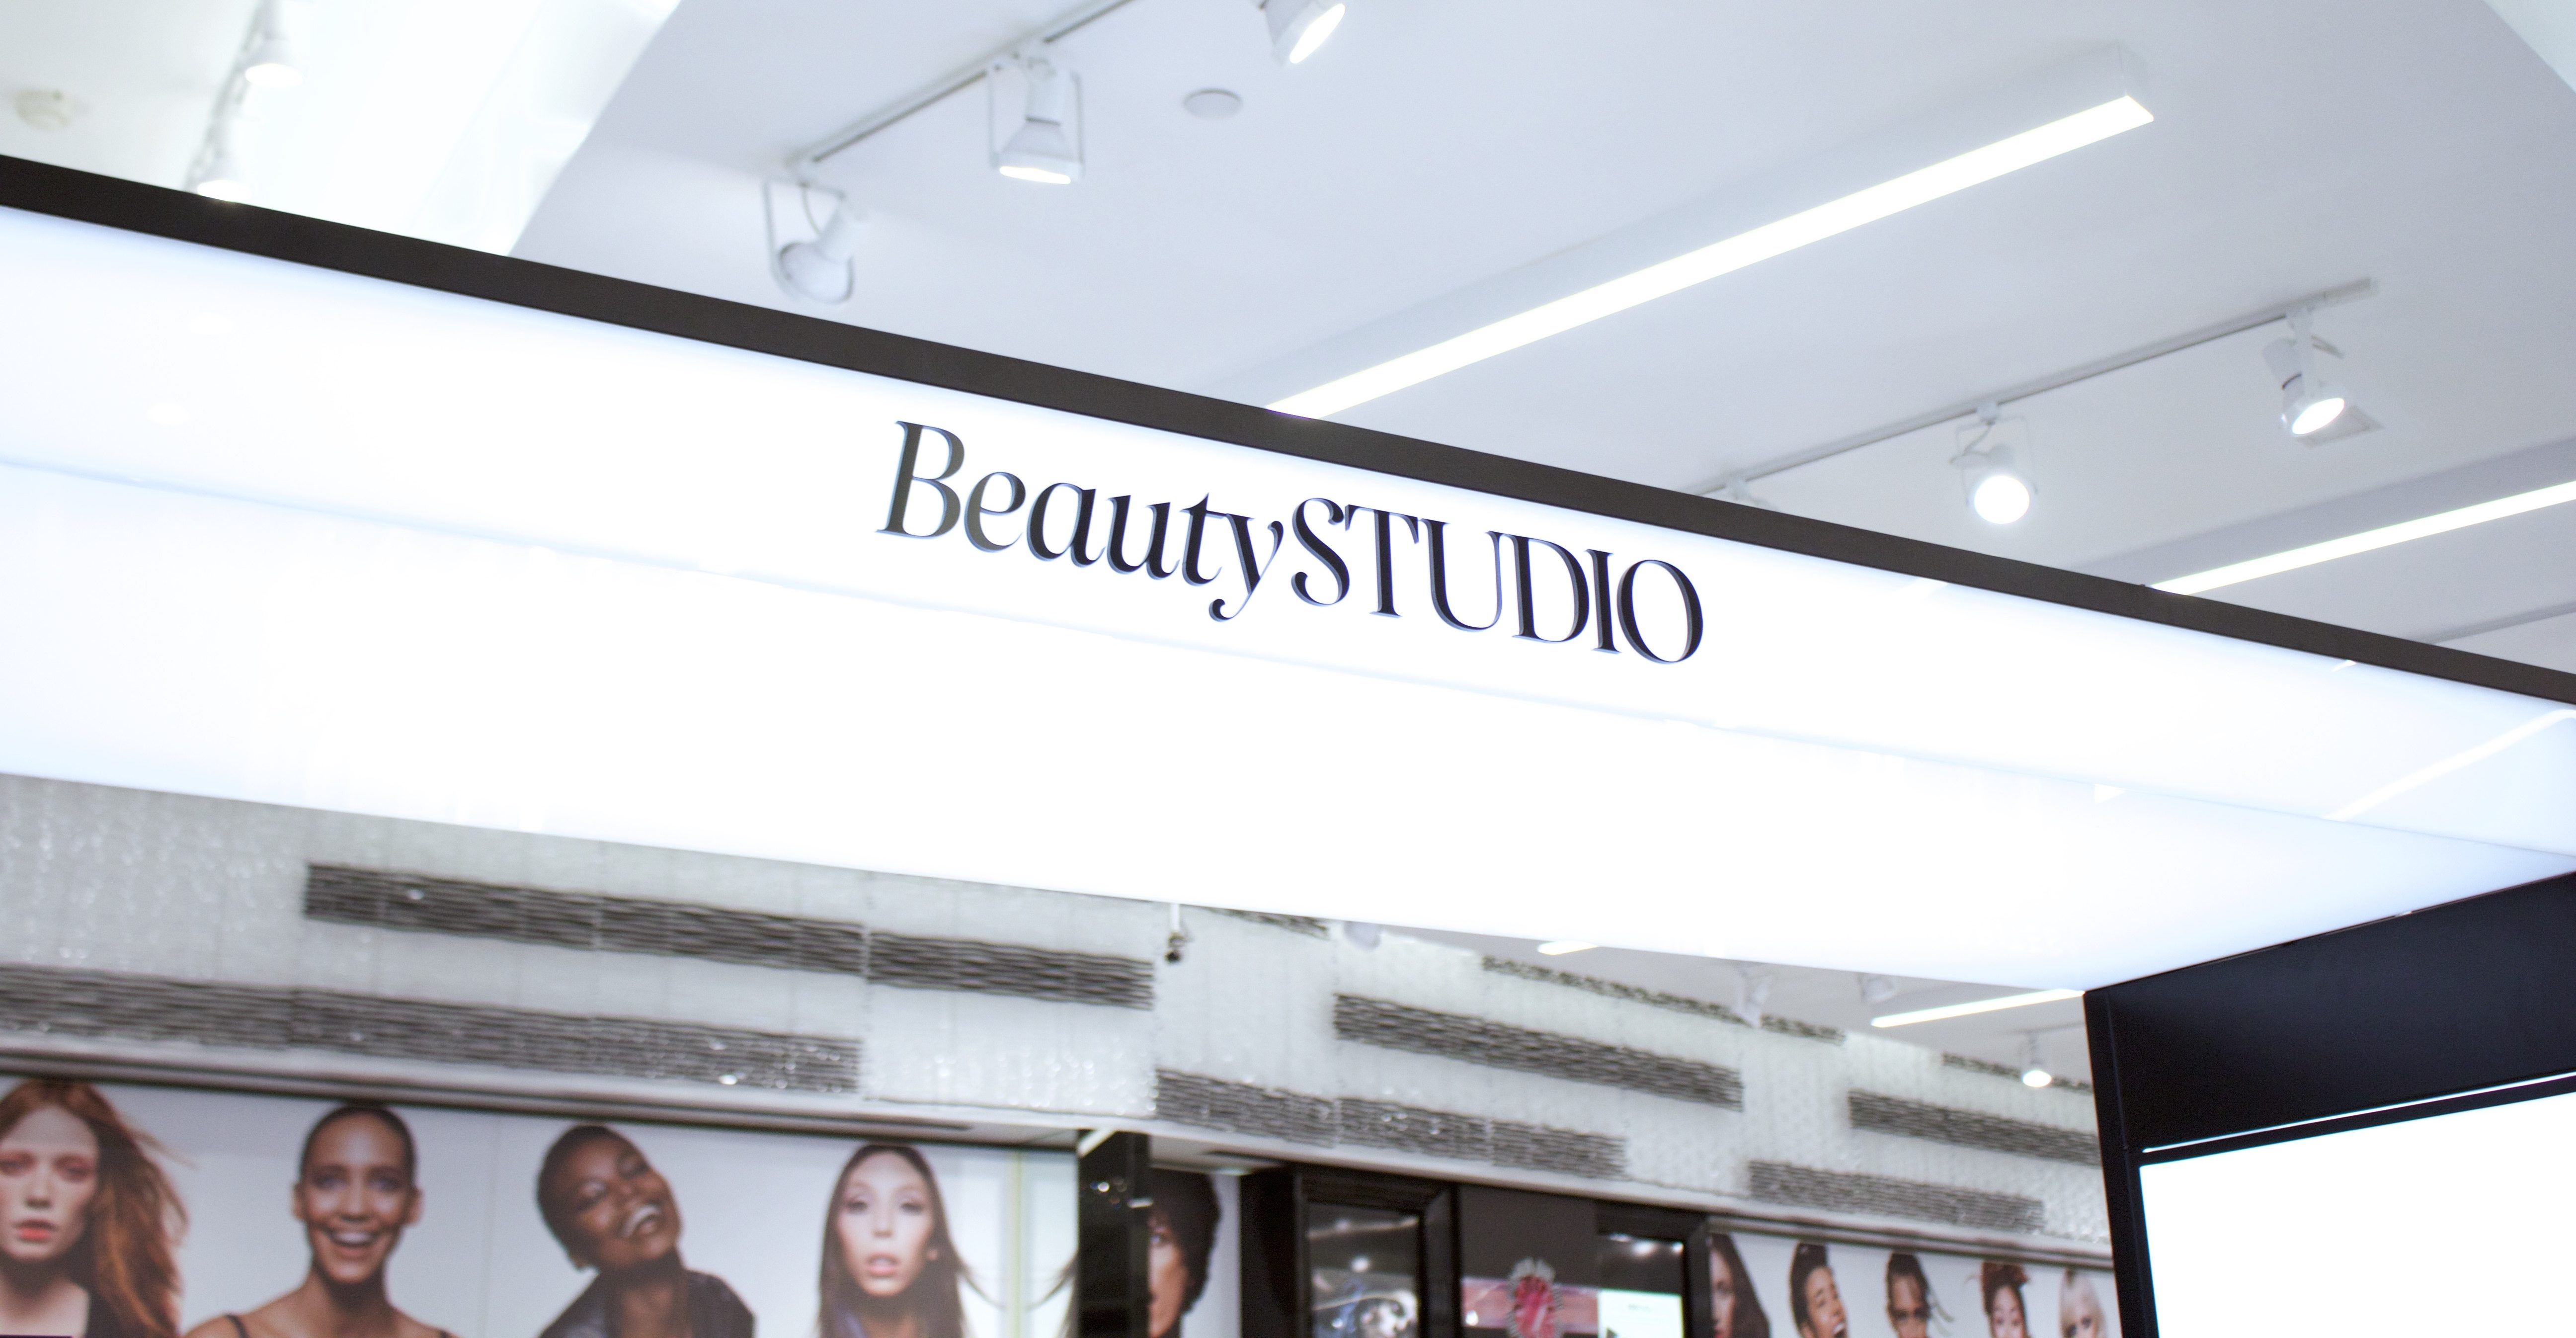 sephora downtown disney beauty studio